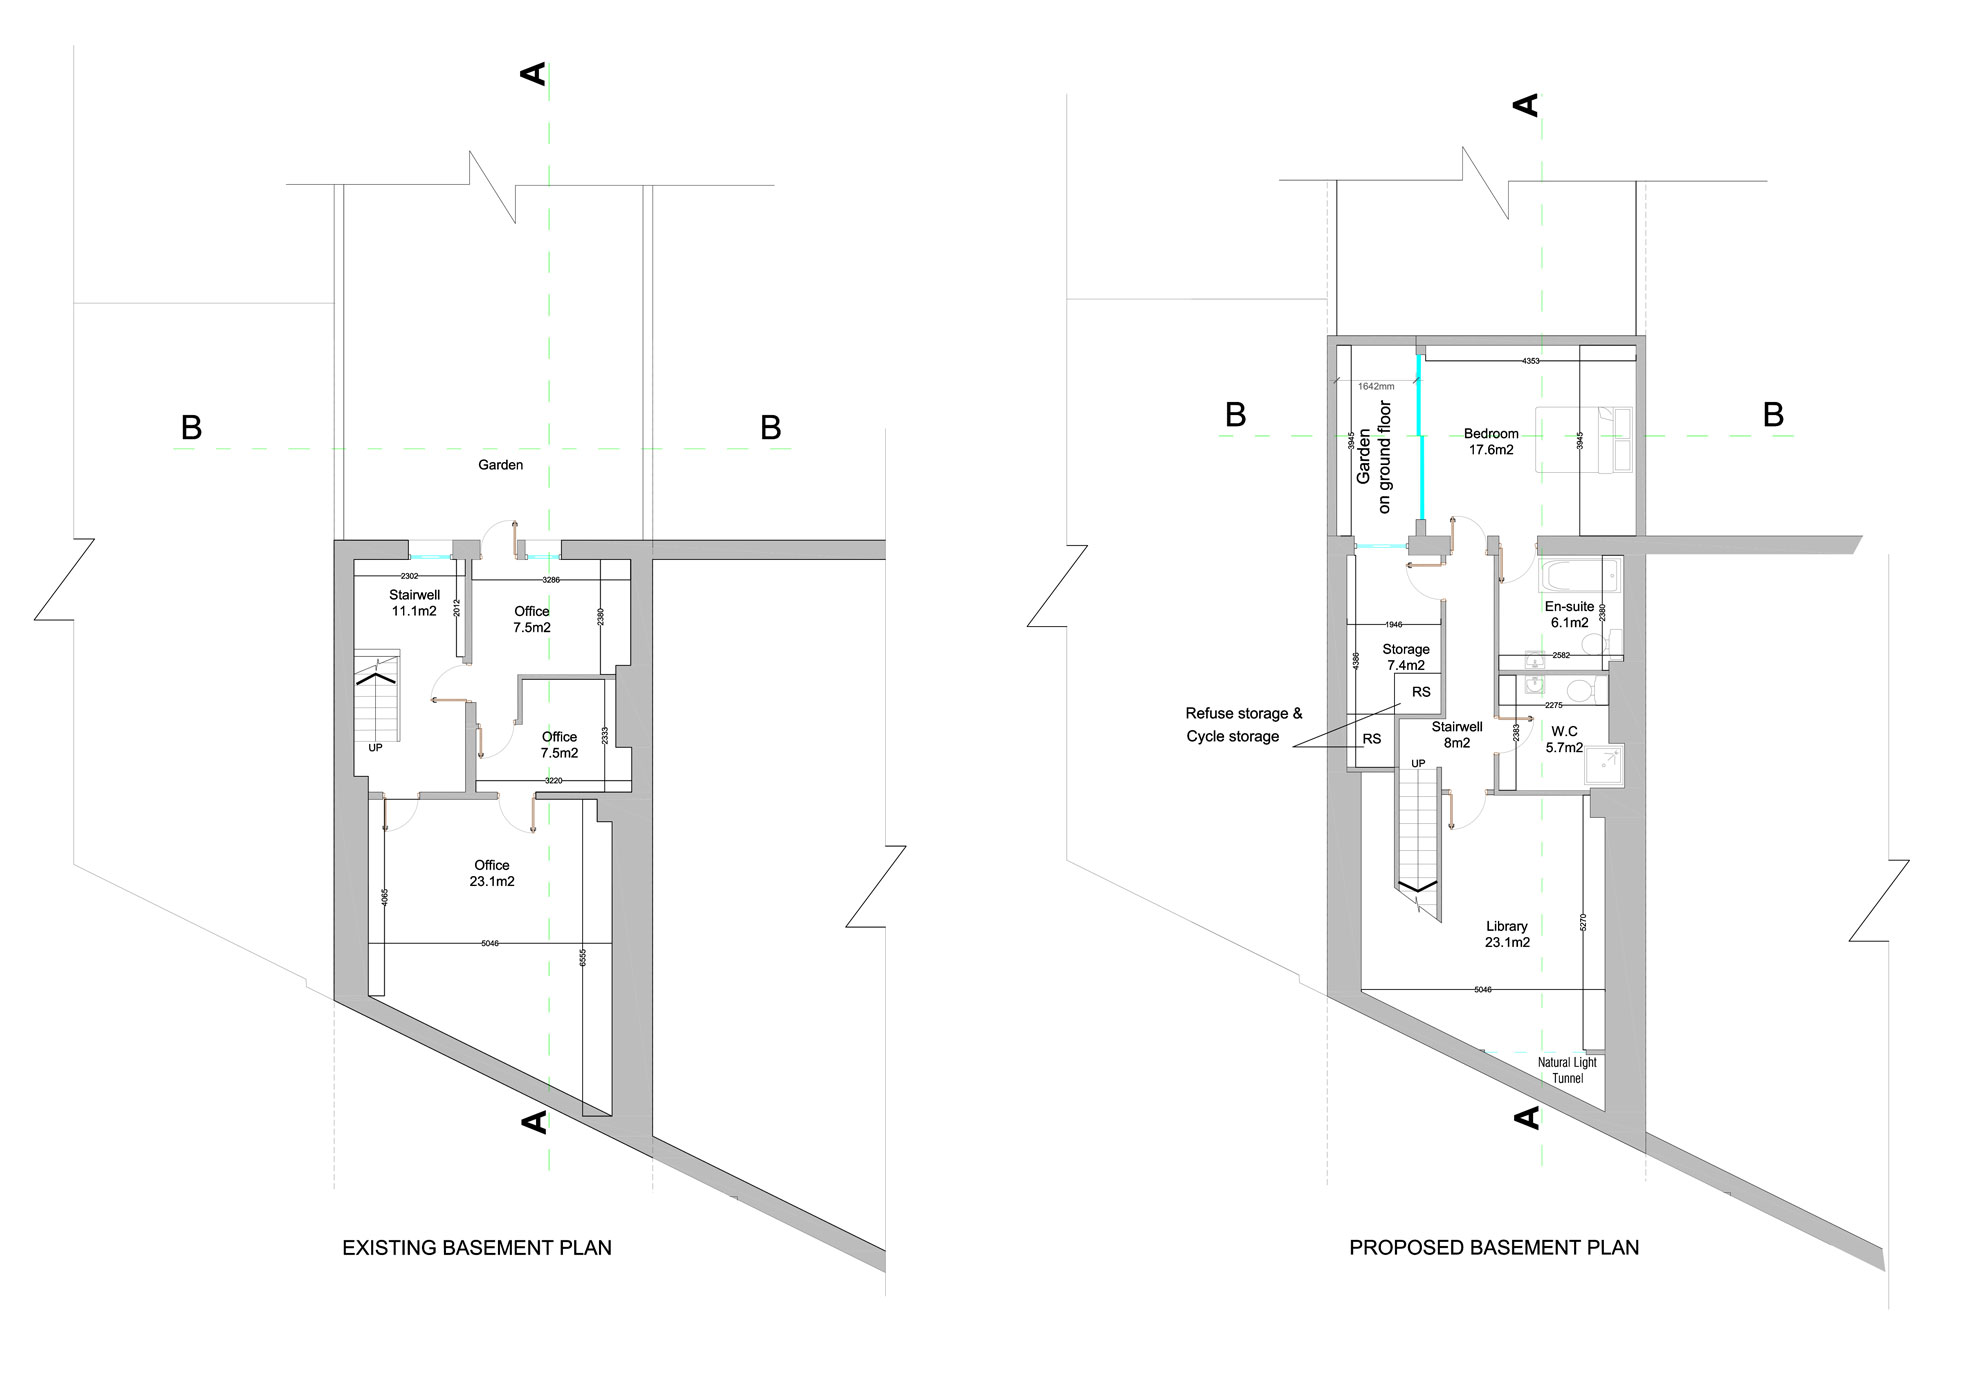 Basement-Extension-in-Islington-Basement-Floor-Plan